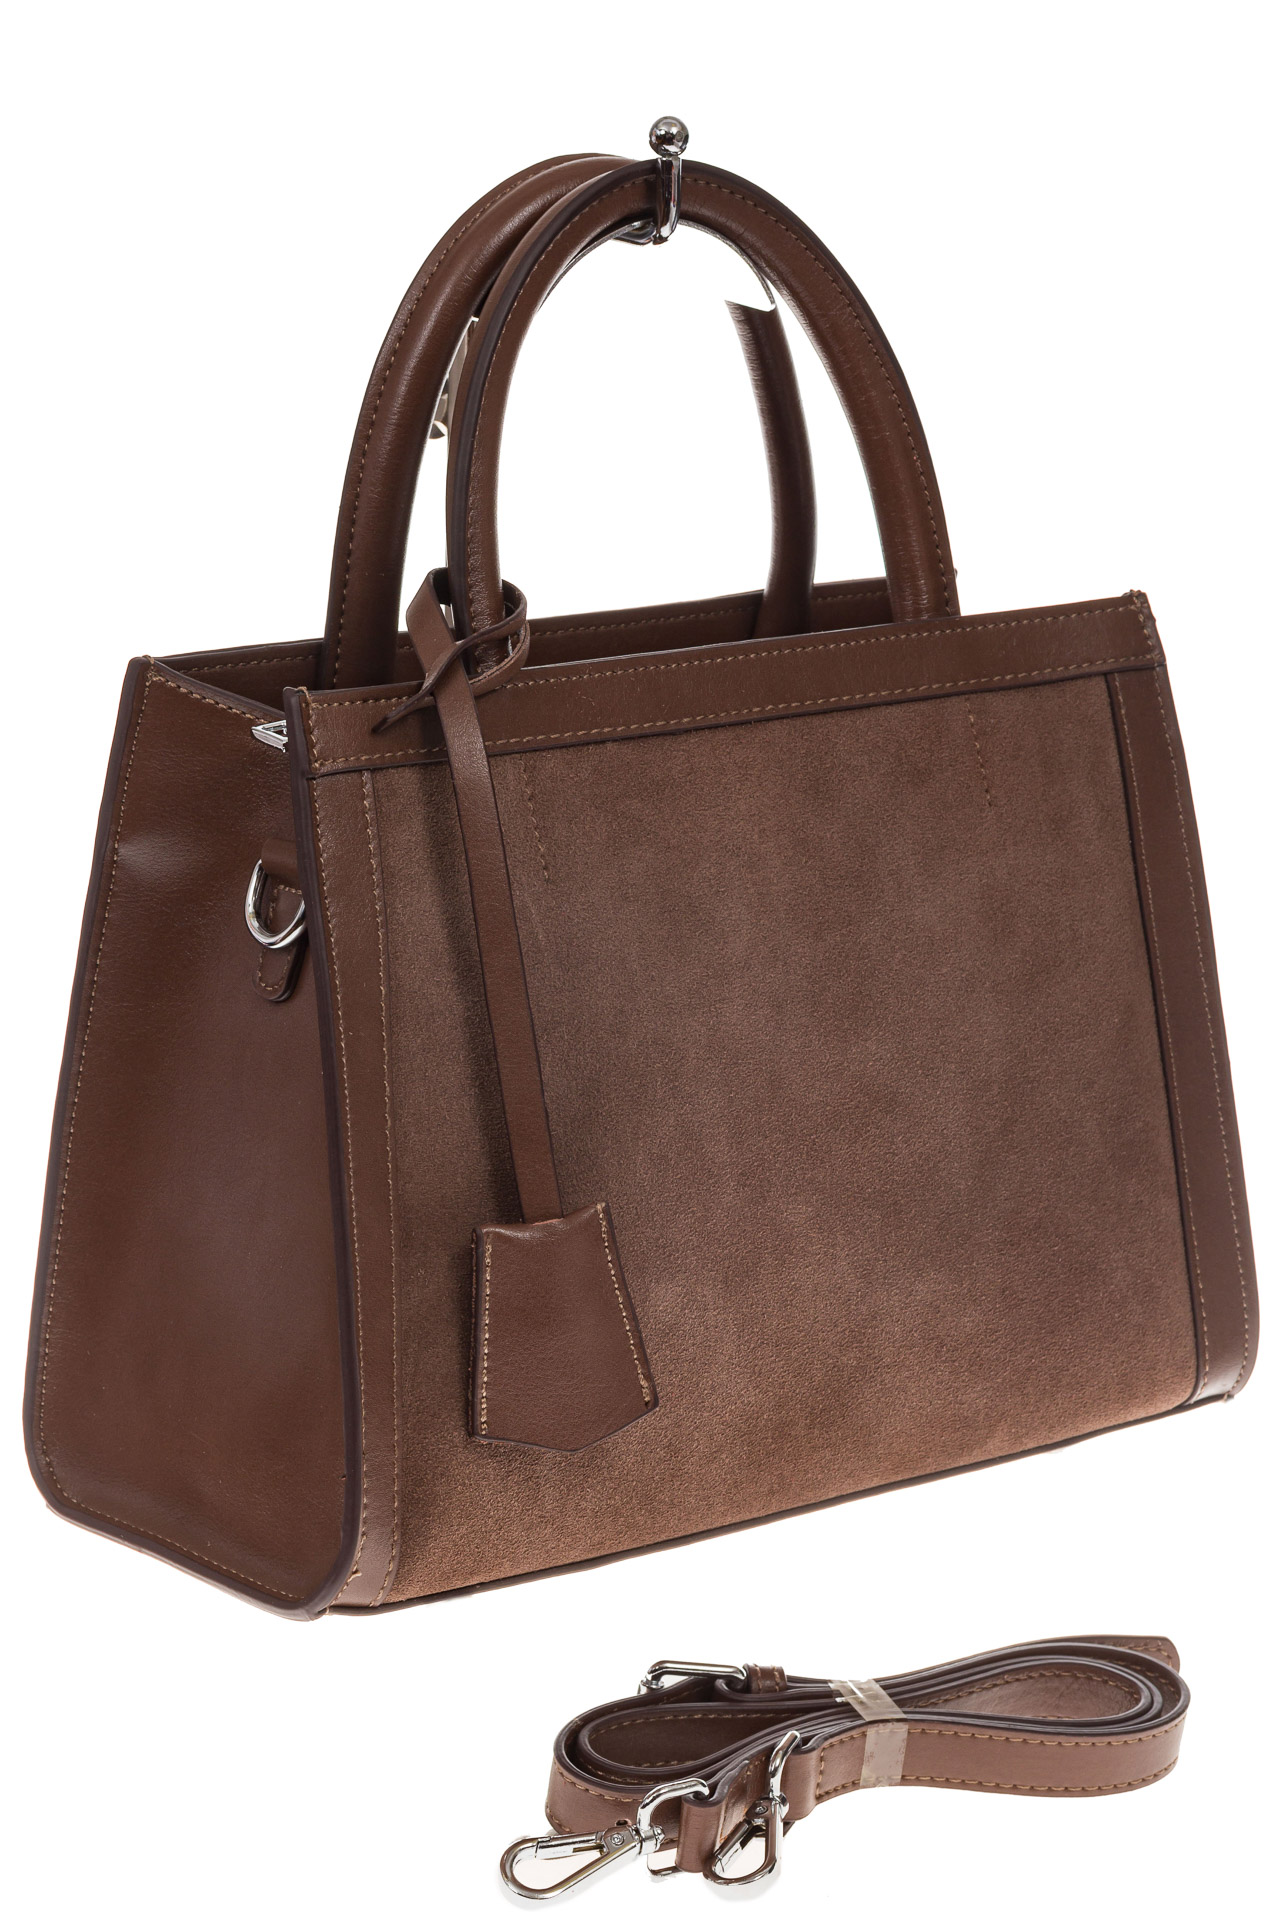 a4503e59e941 На фото 1 - Женская сумка из натуральной кожи и замши, цвет коричневый